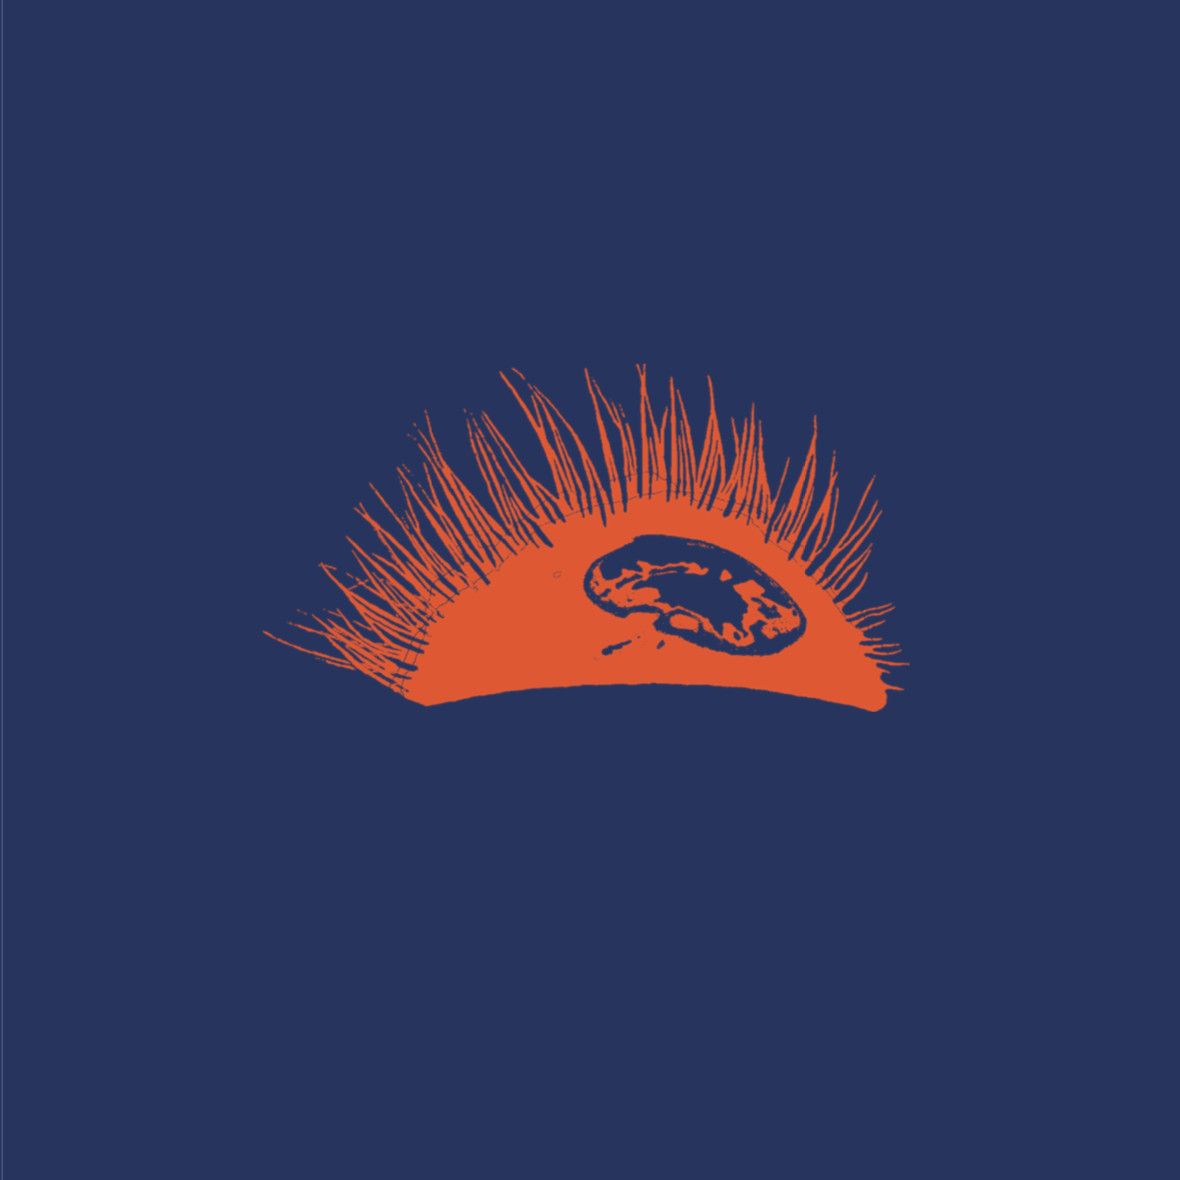 Sunrise Twenty-Twenty (RSD 2020) - The Bleeder Group - Musik - Escho - 9958285603168 - 26/9-2020